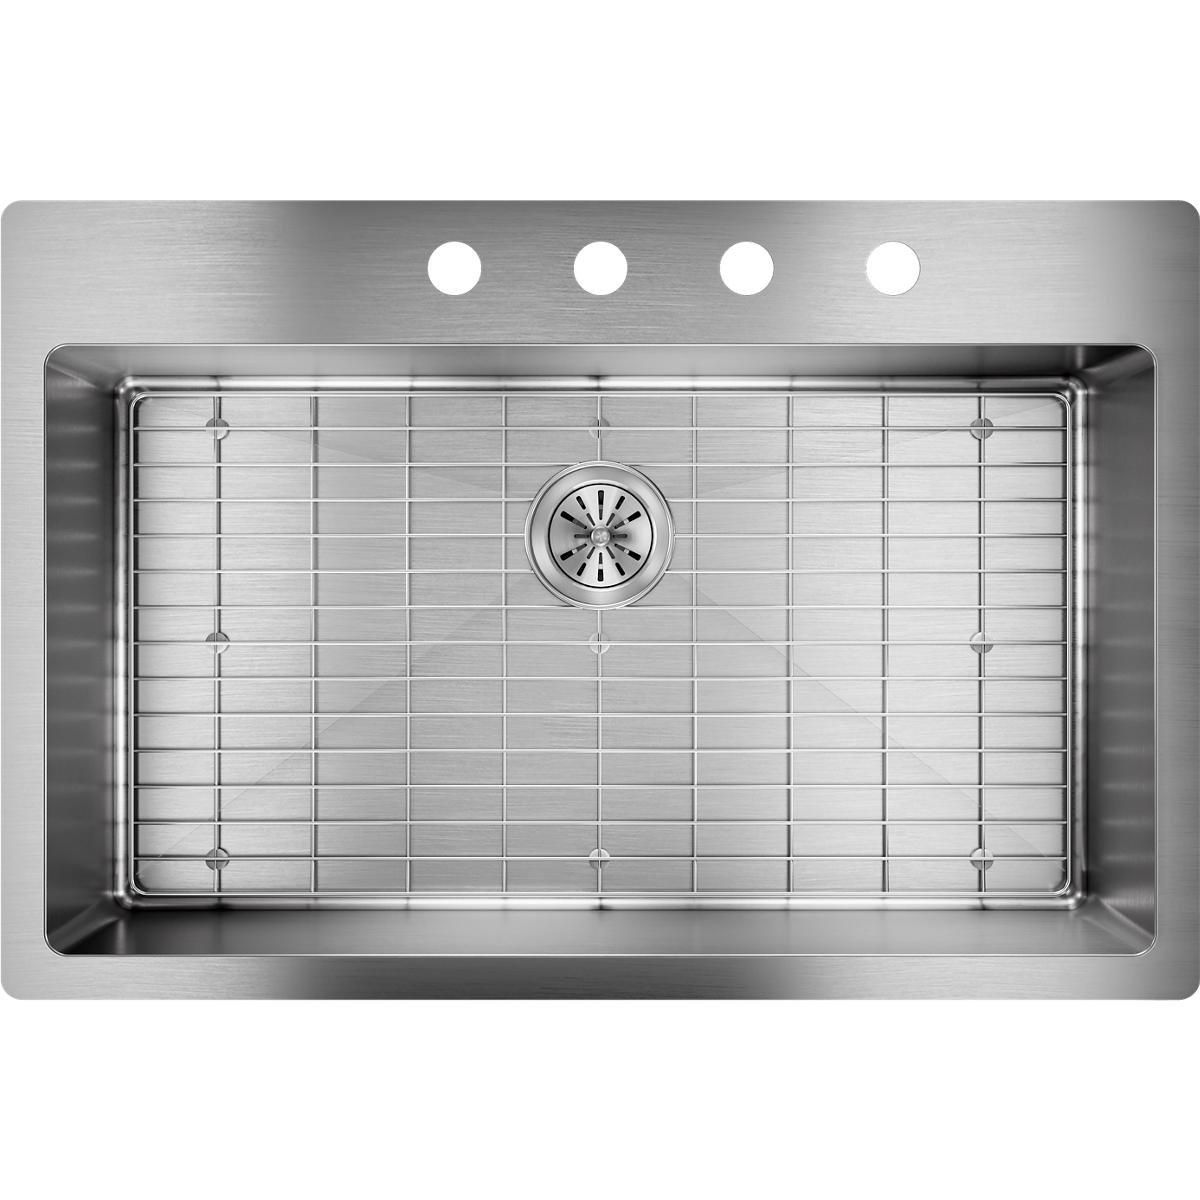 Elkay Crosstown ECTSRS33229TBG4 Single Bowl Dual Mount Stainless Steel Kitchen Sink Kit